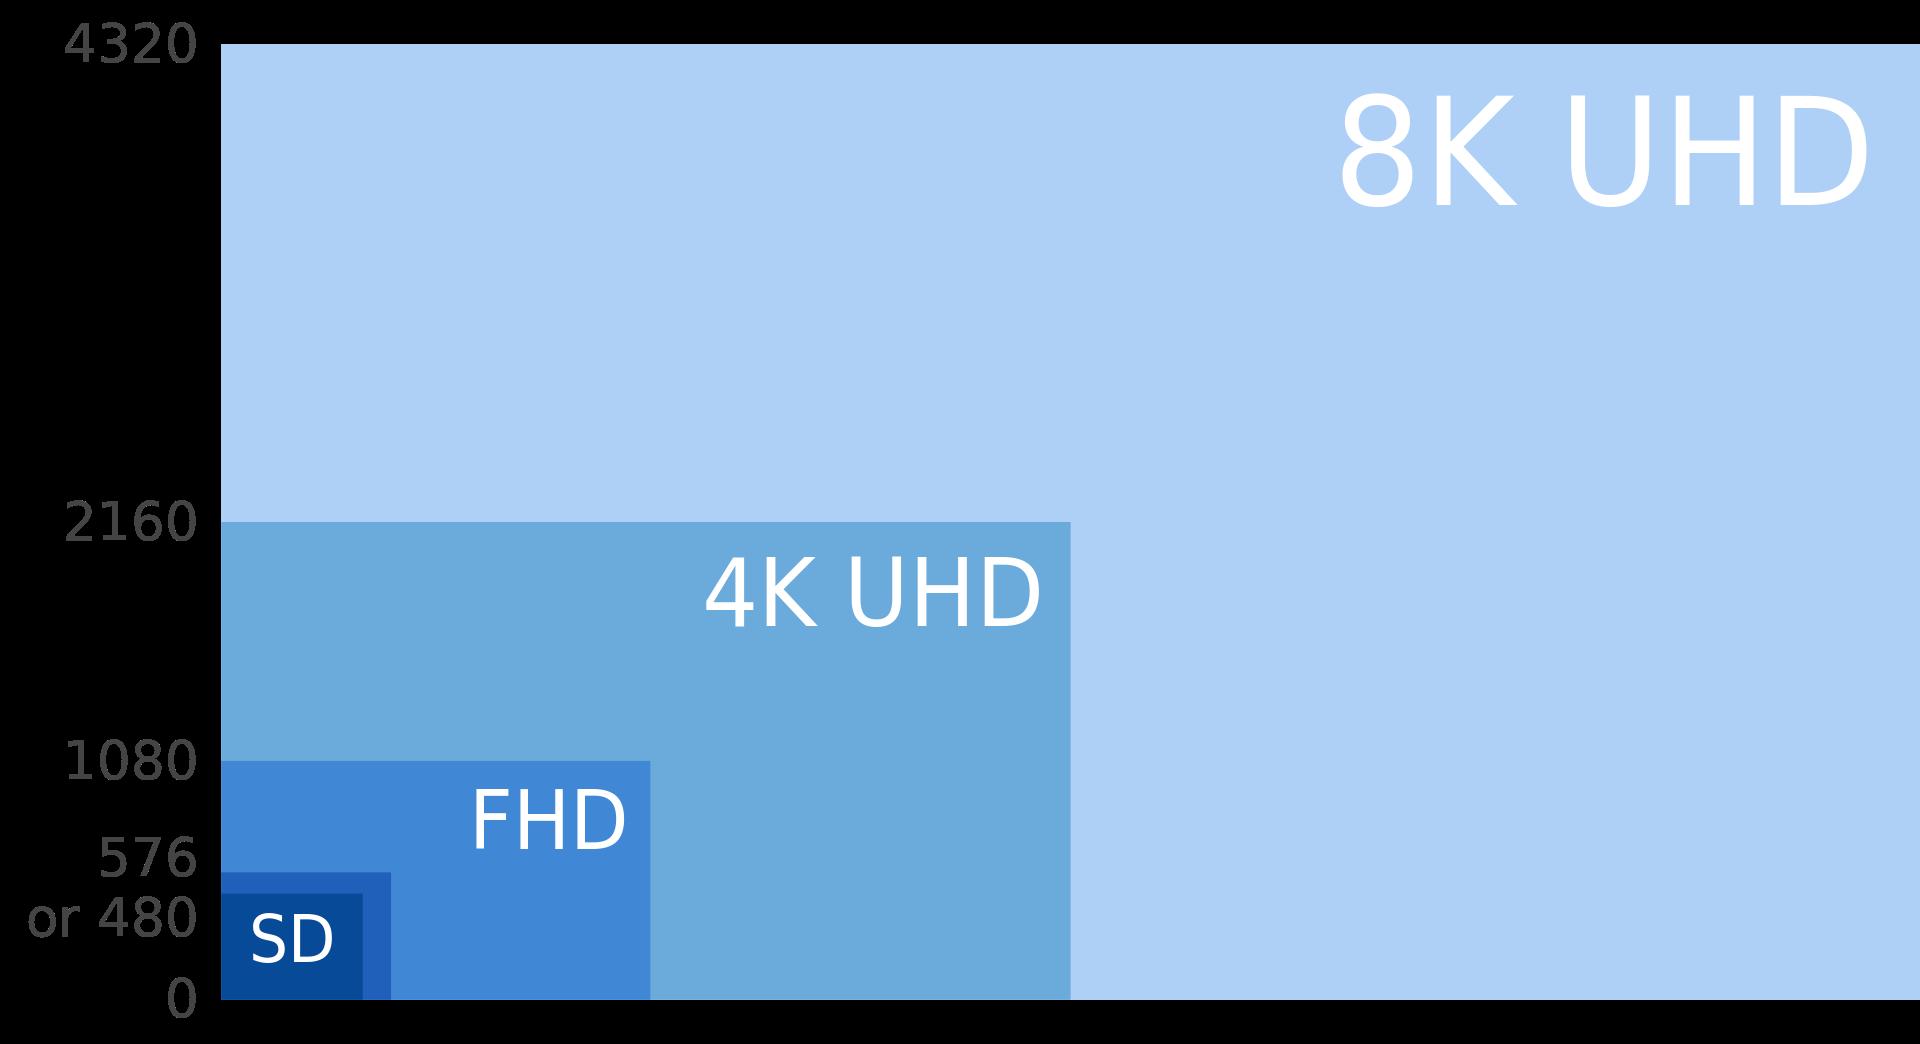 Źródło: Wikipedia - http://en.wikipedia.org/wiki/8K_resolution